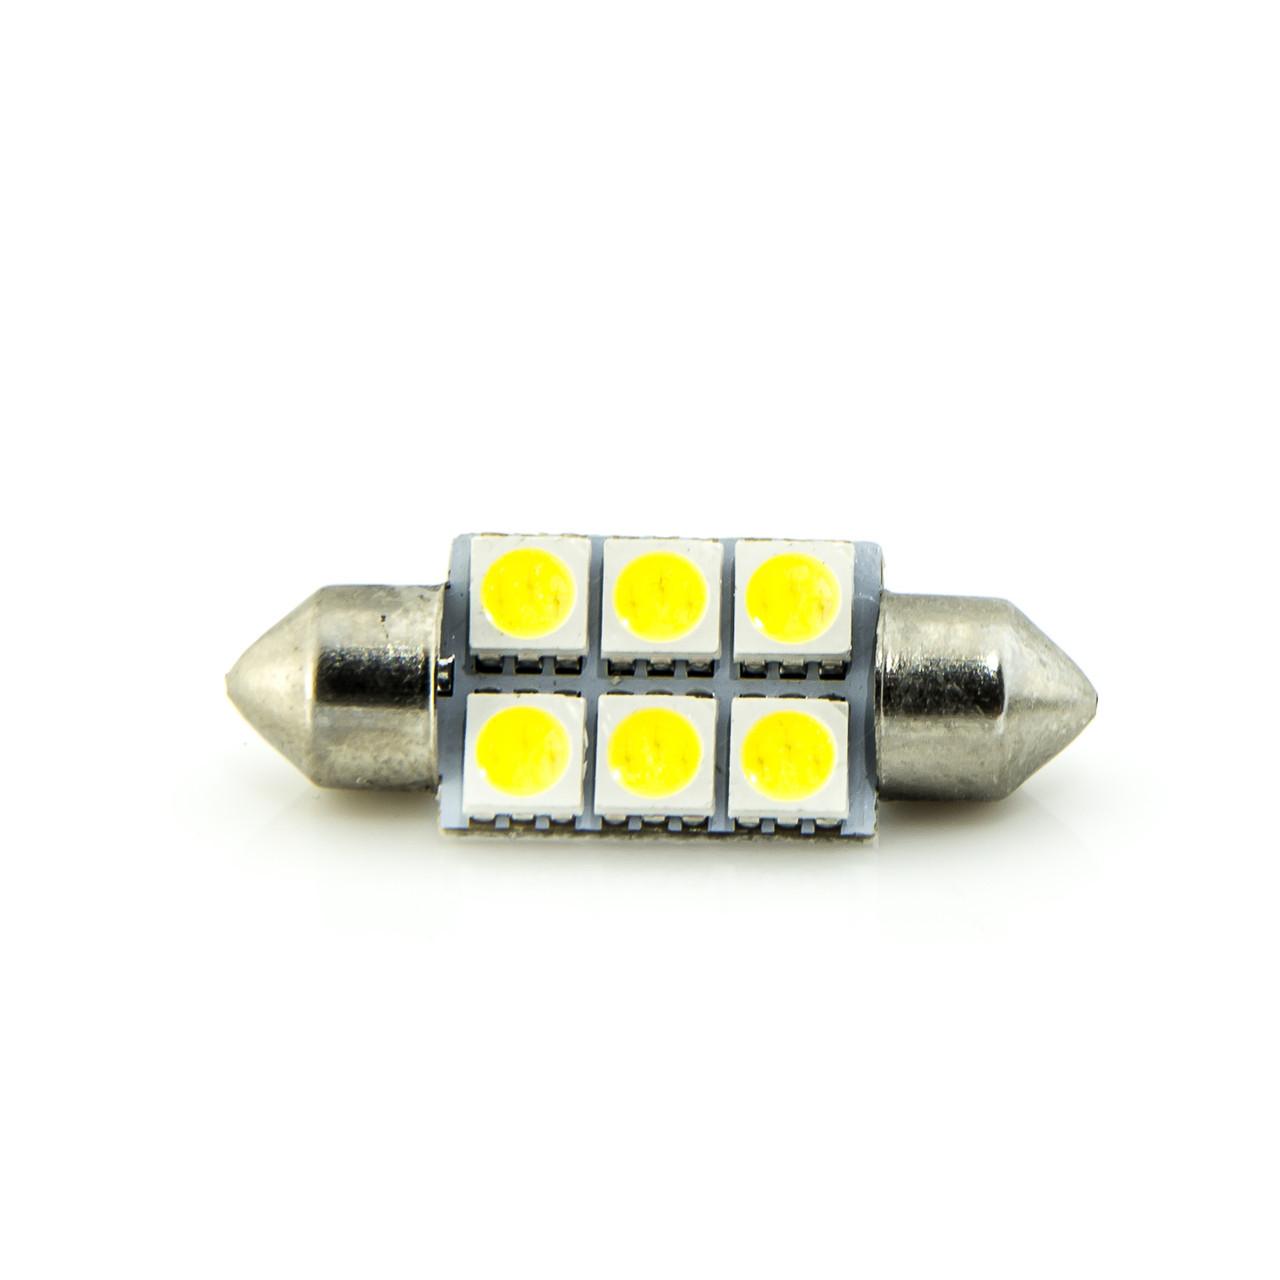 Лампа LED 24V AC (C5W) 6SMD 5050 36мм 85Lm БЕЛЫЙ